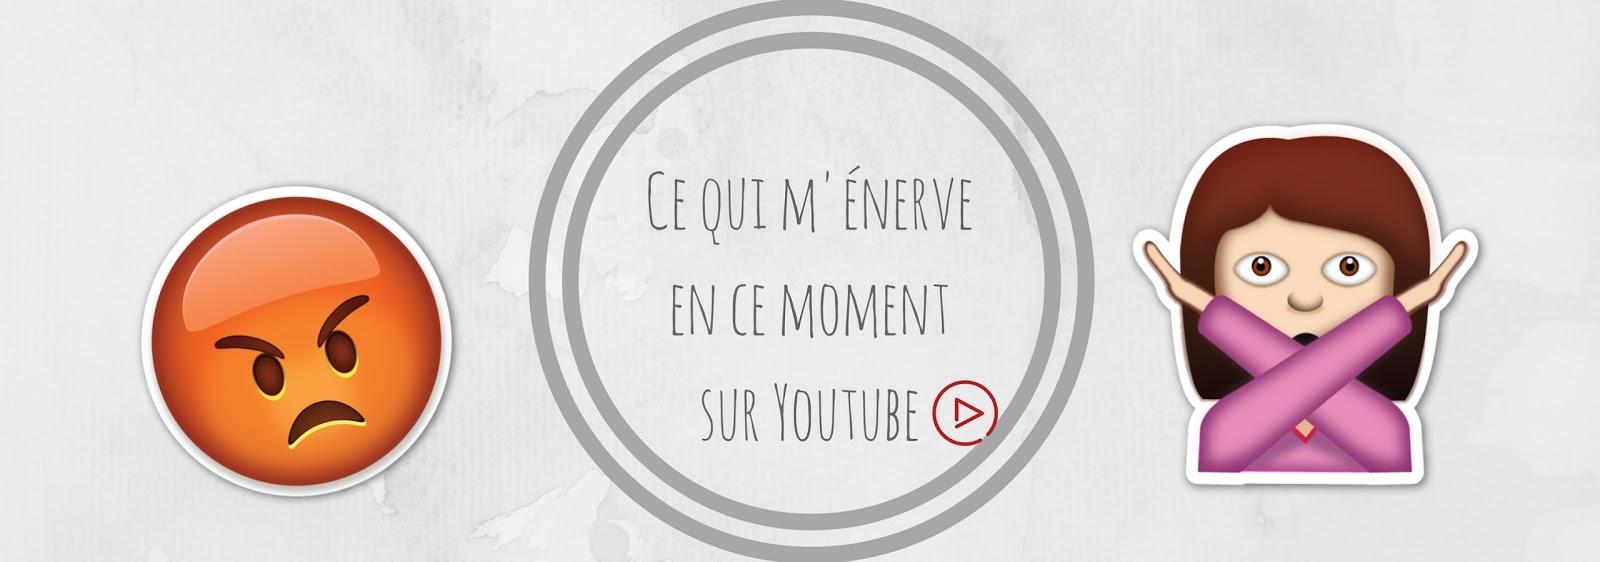 Avis négatif sur Youtube